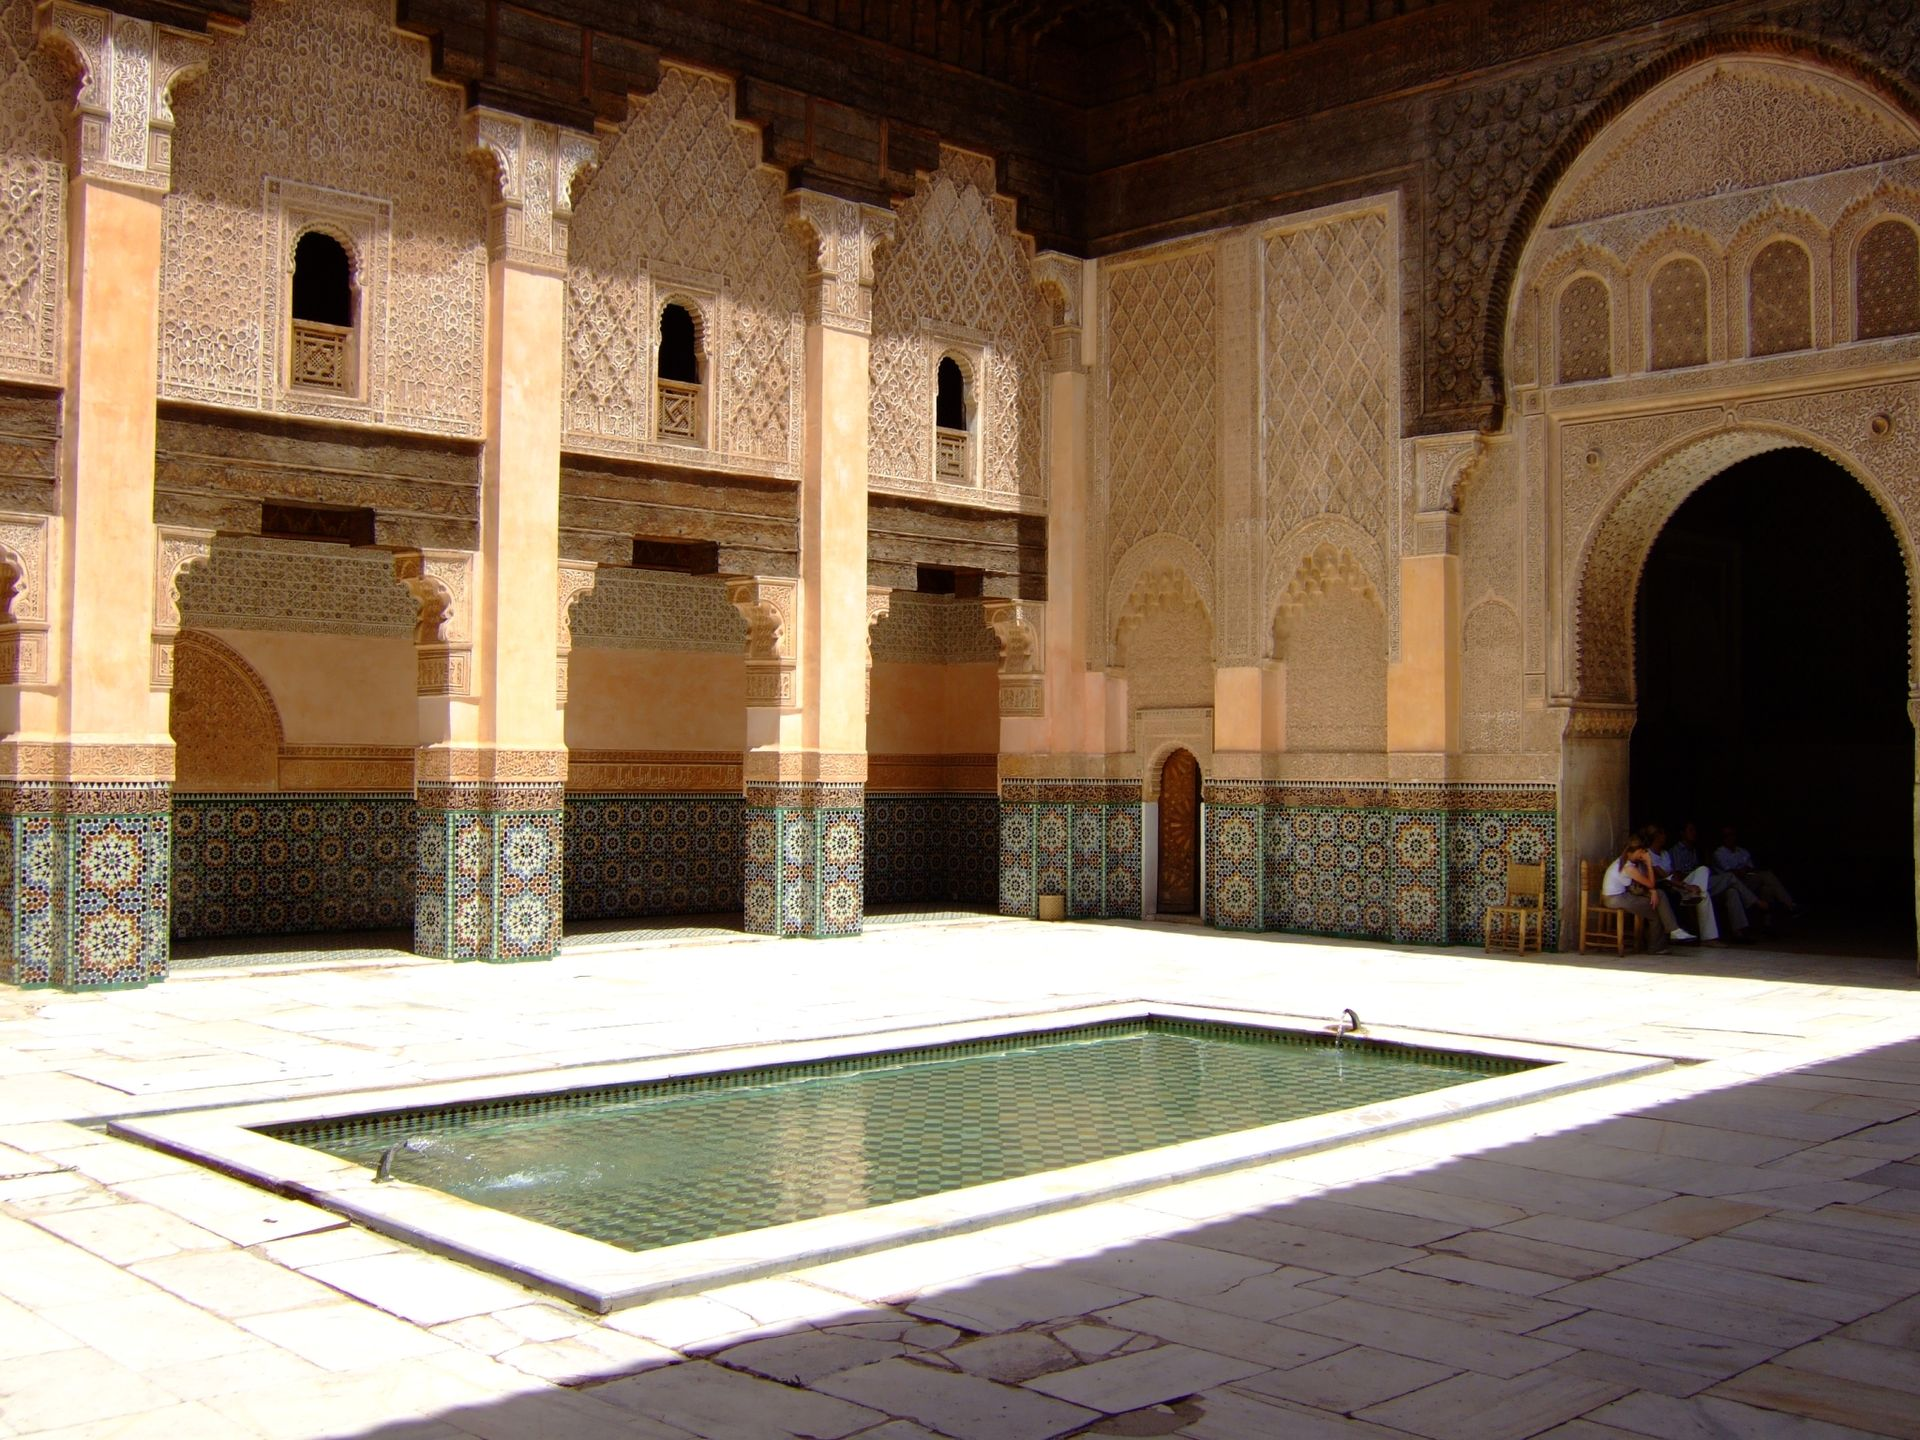 M dersa ben youssef wikip dia - L architecture andalouse ...